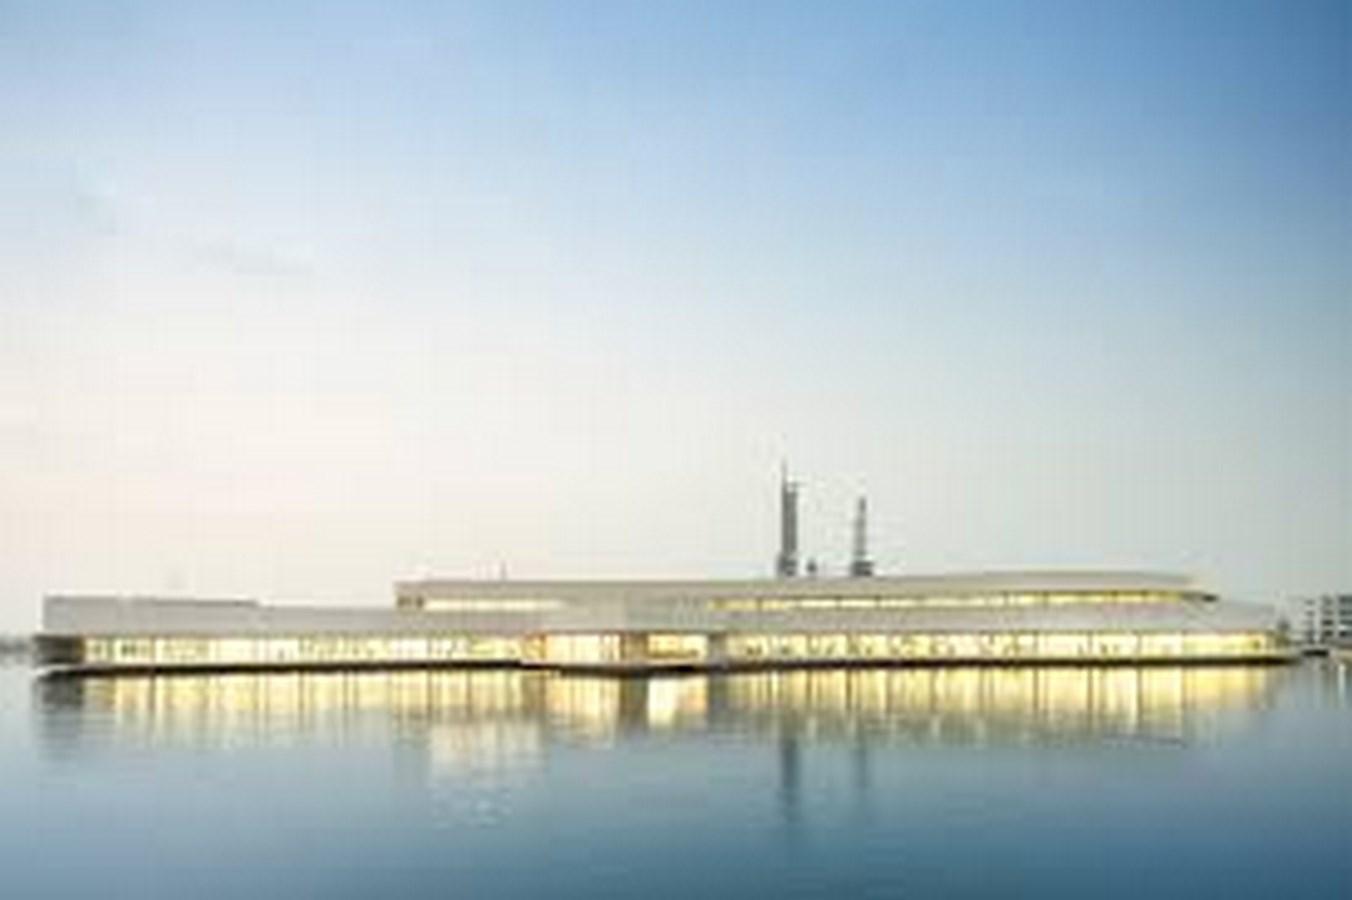 Alvaro Siza- Leca Building on the Water - Sheet6